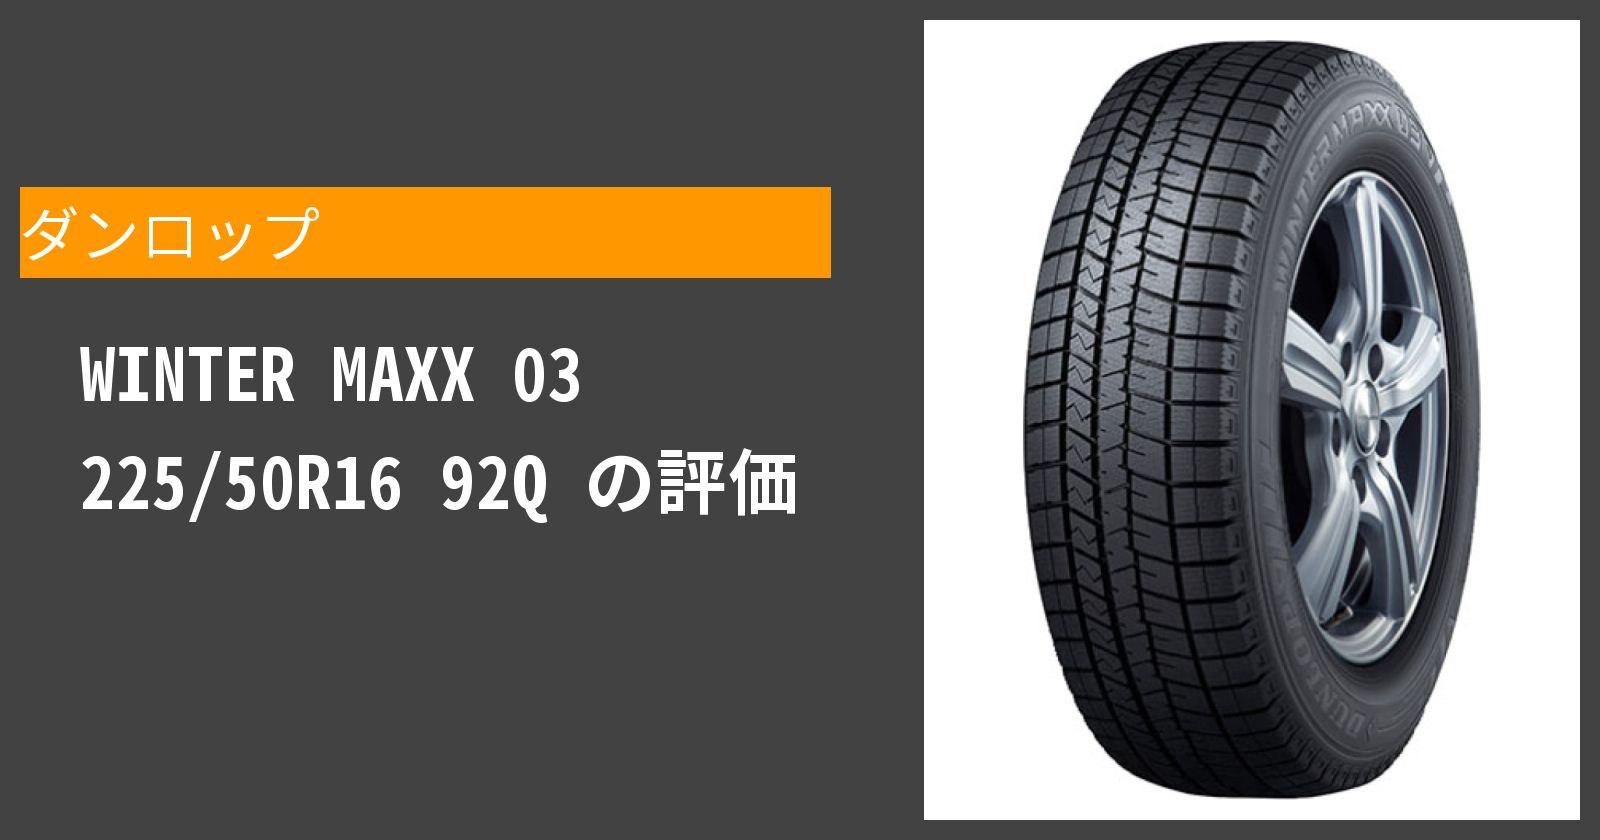 WINTER MAXX 03 225/50R16 92Qを徹底評価